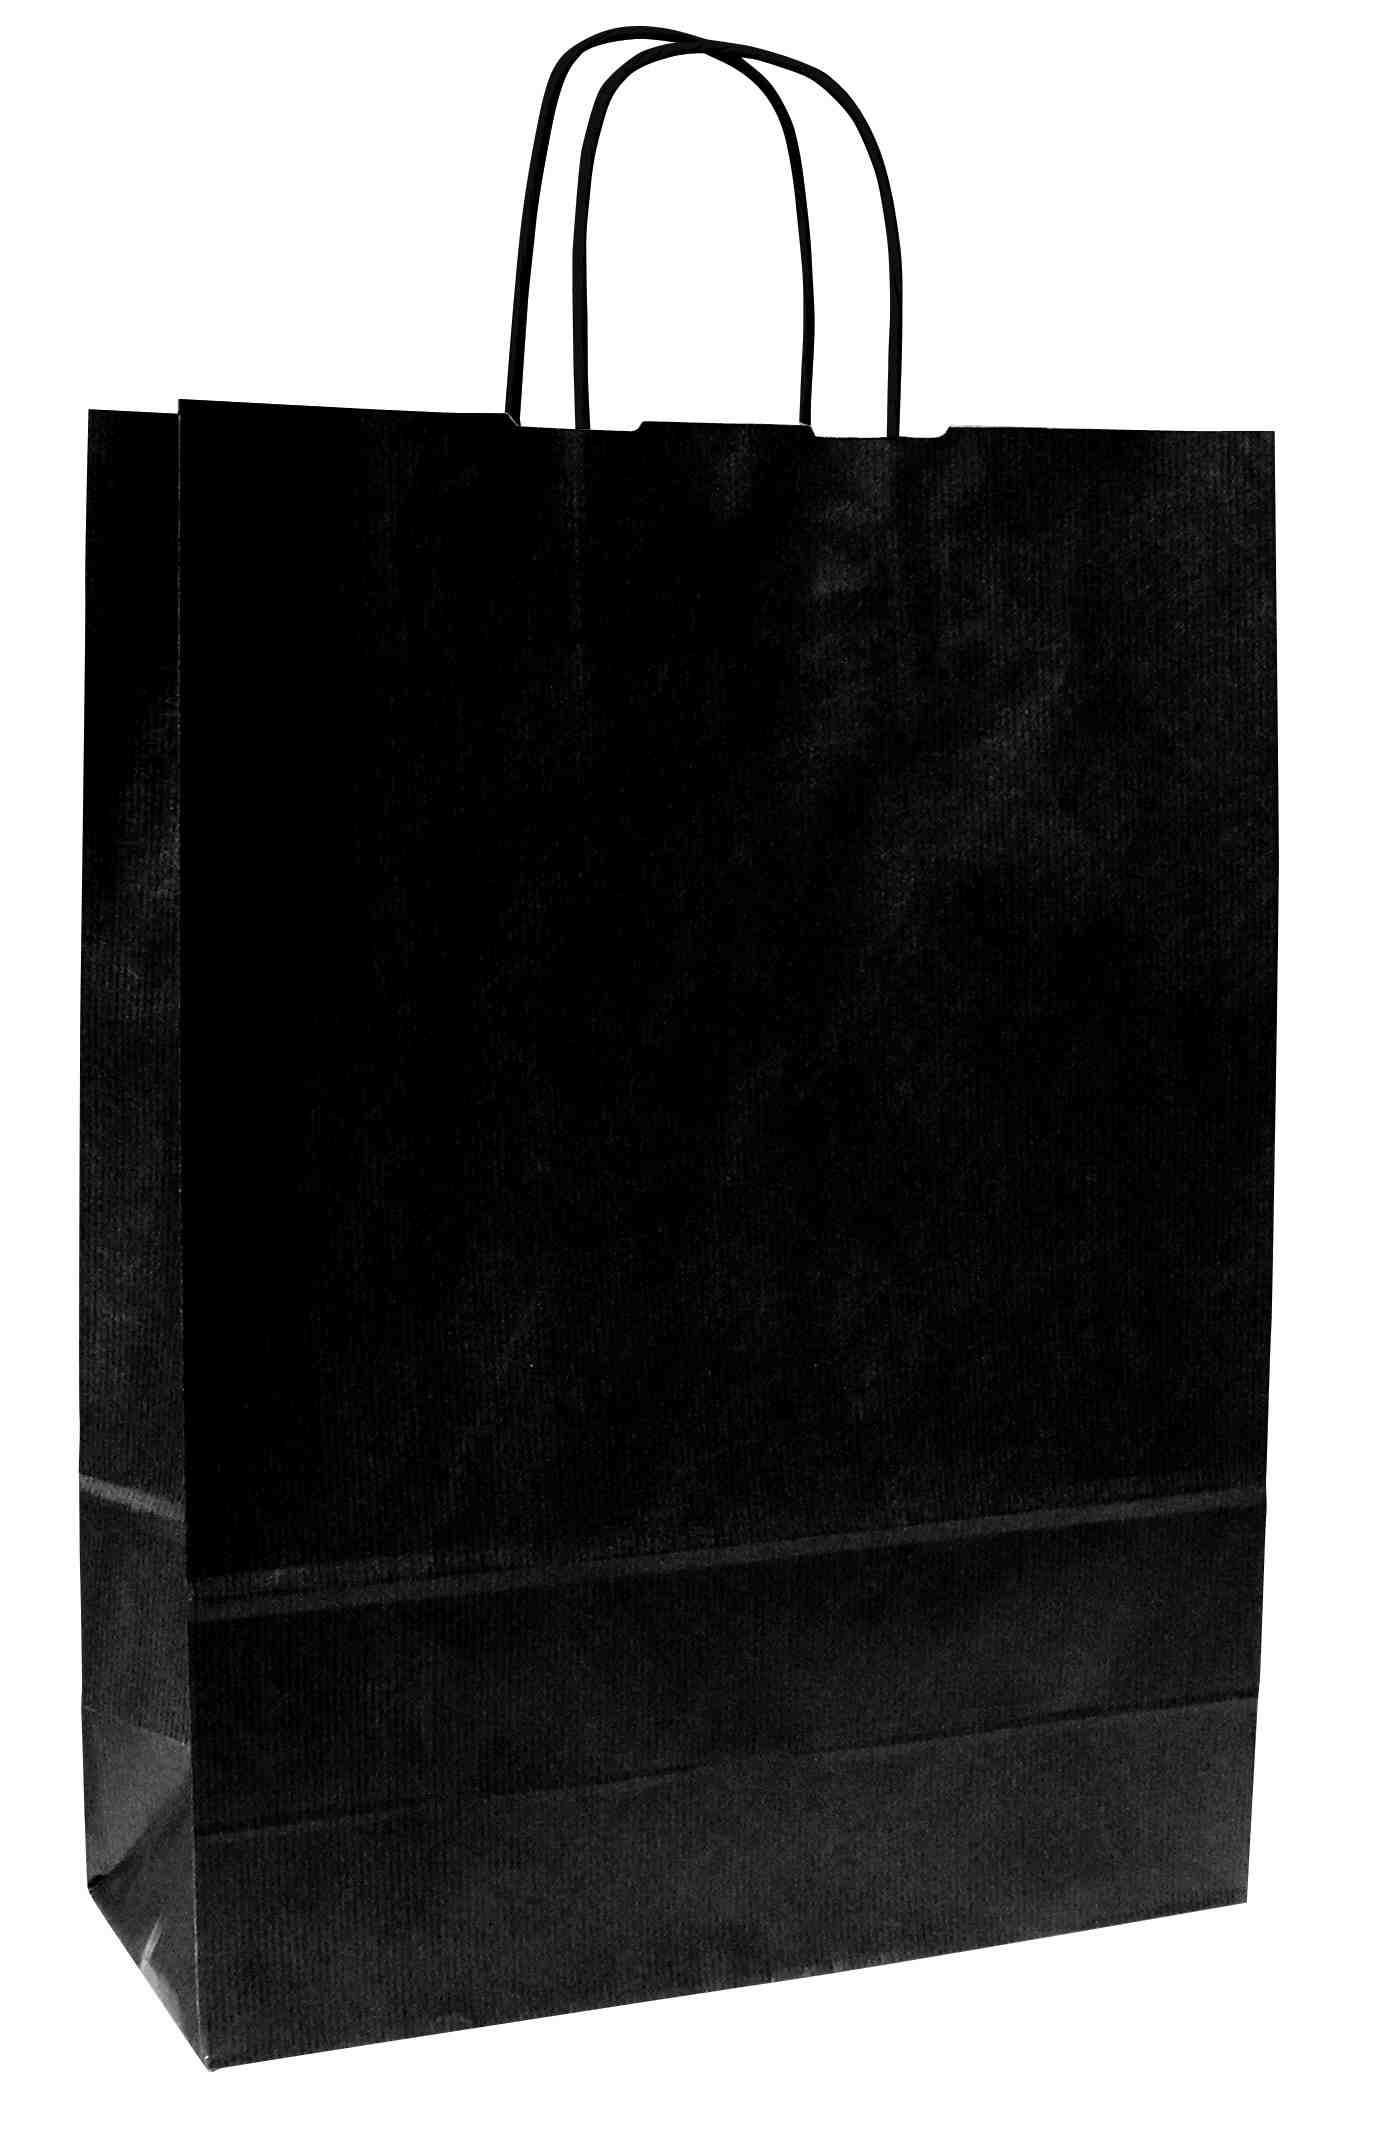 Papírové tašky o rozměru 180 x 80 x 250 mm,černé, kr. pap. držadlo.